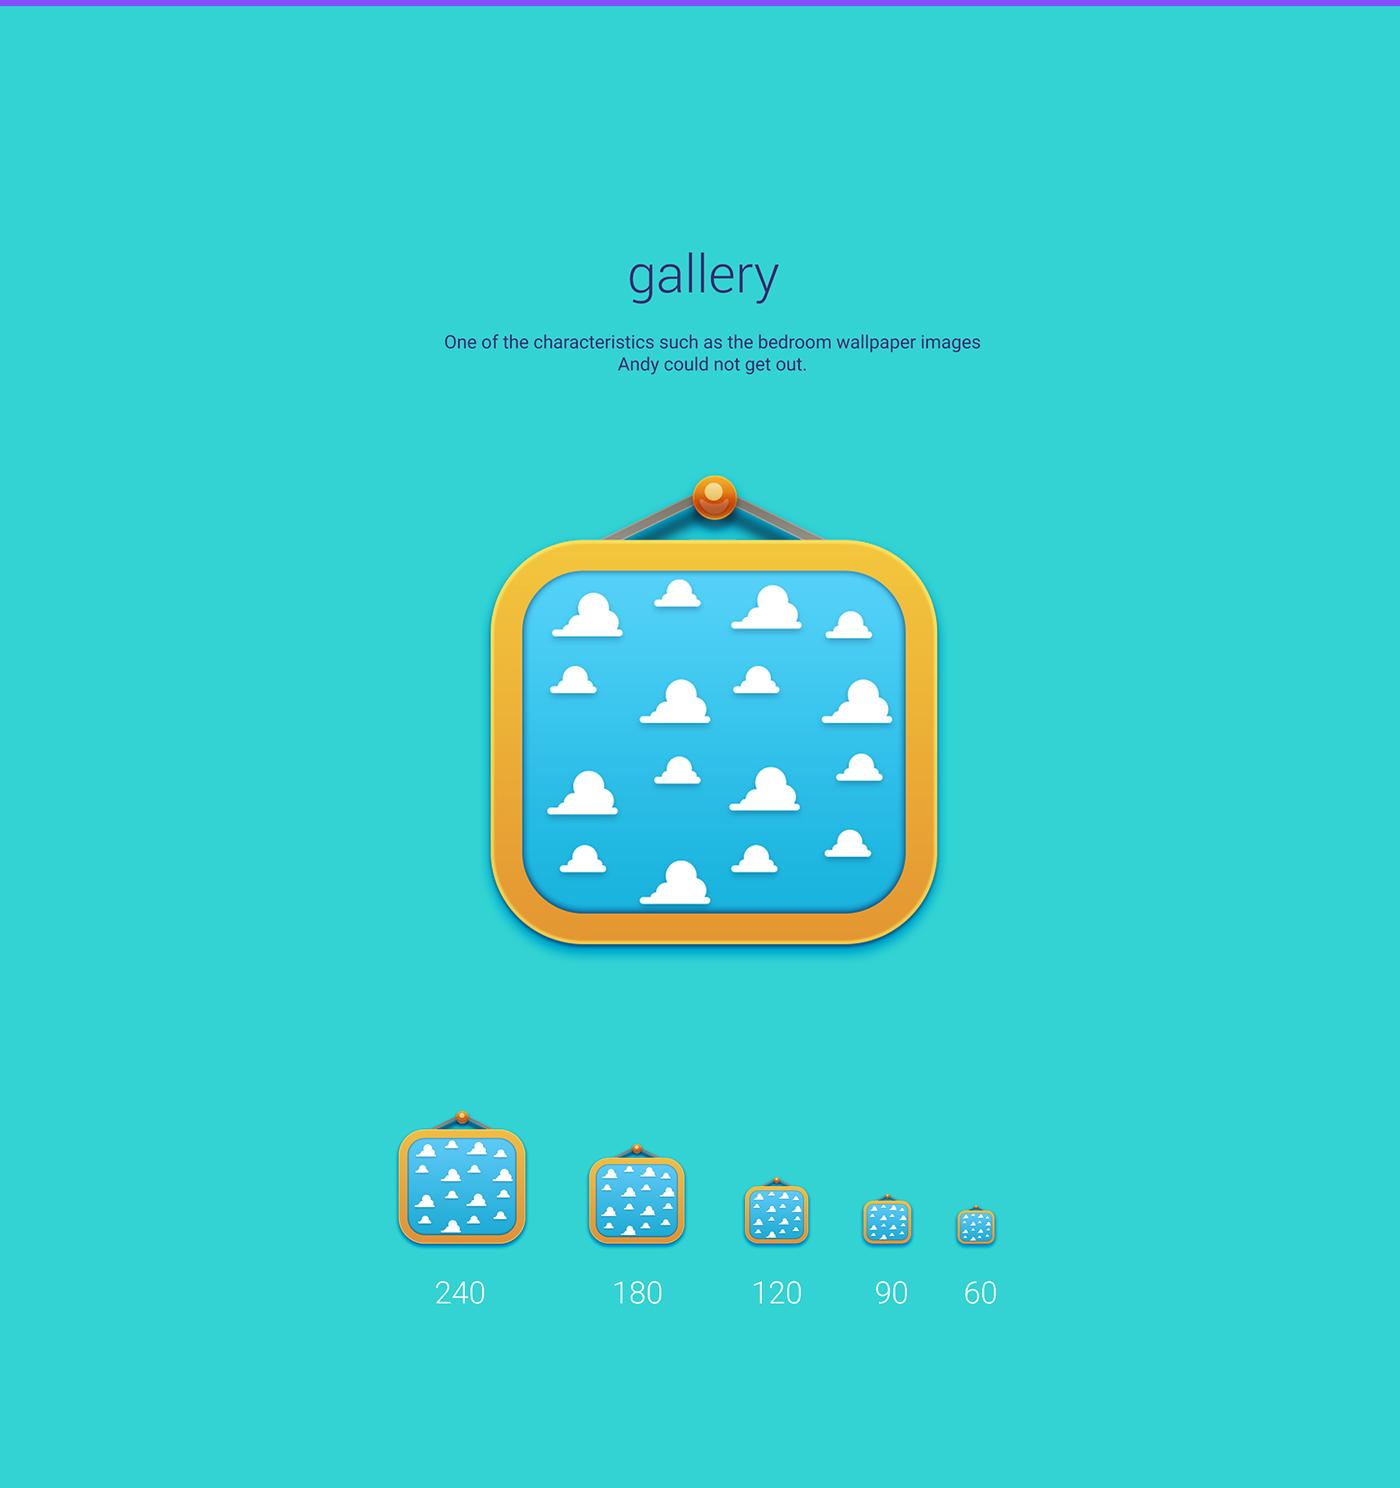 disney-pixar-toy-story-android-icons-leo-natsume-03